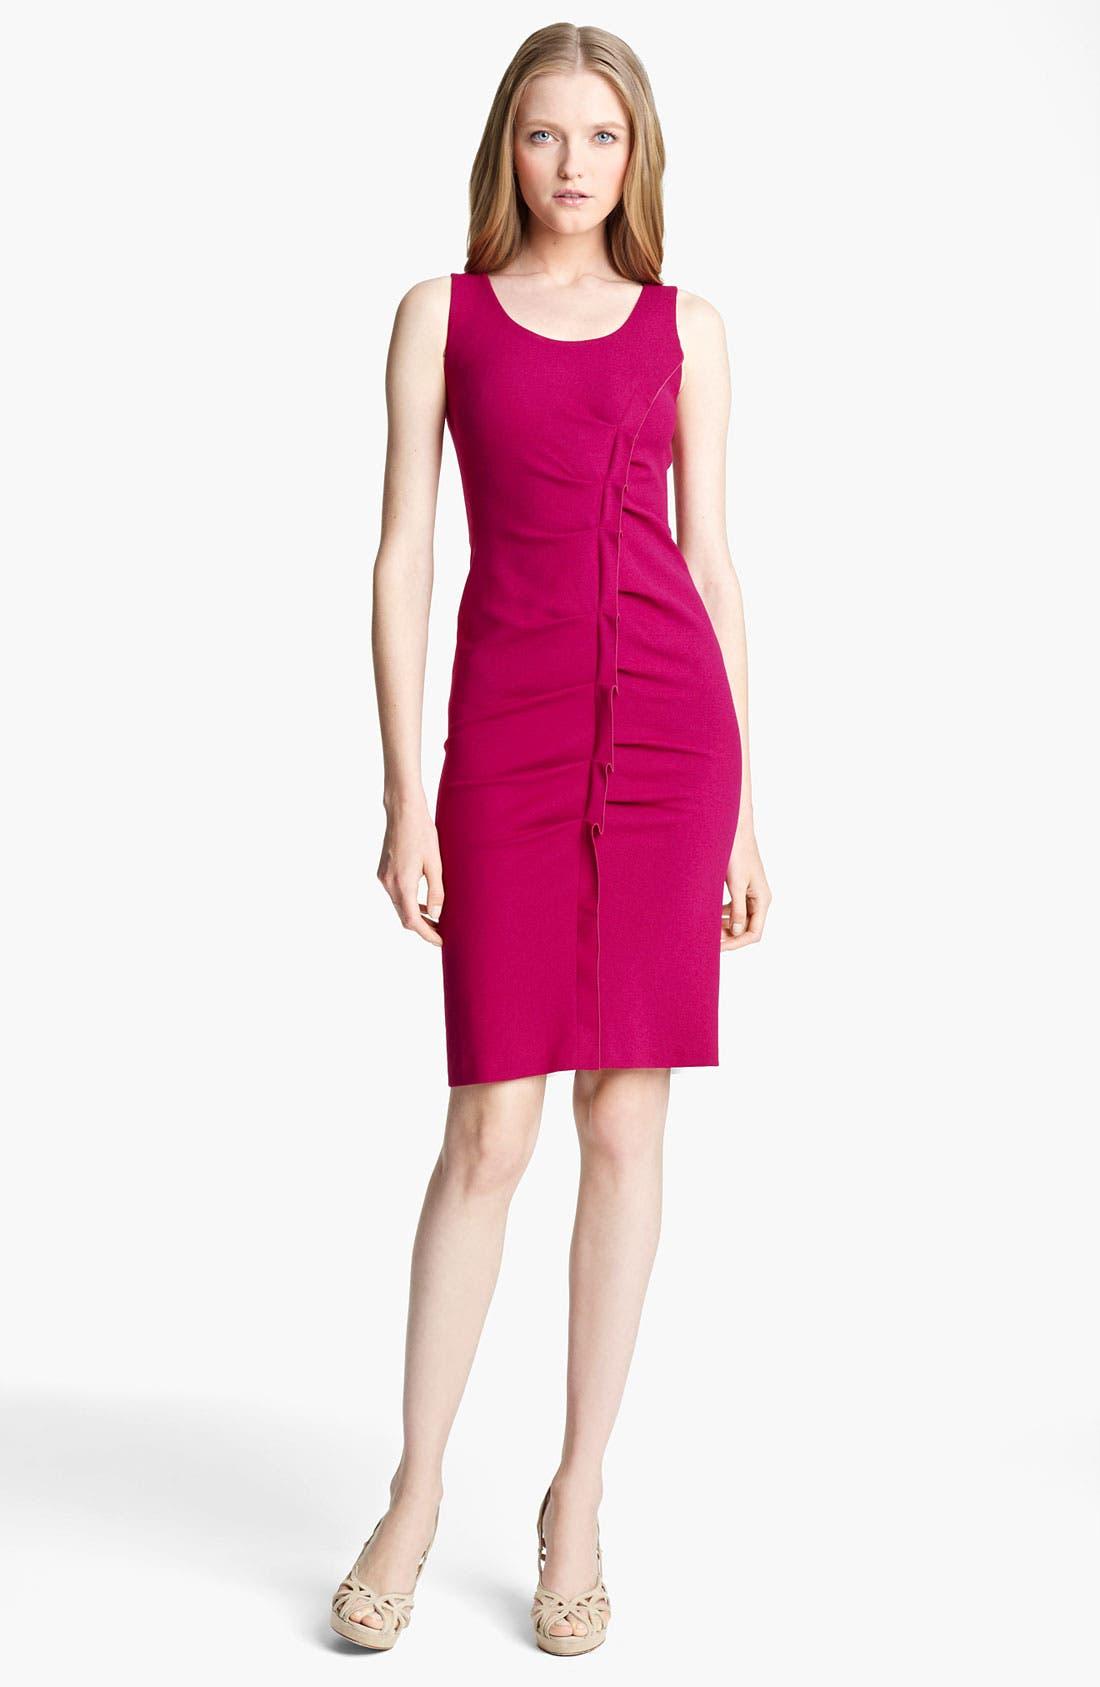 Alternate Image 1 Selected - Armani Collezioni Tuck Detail Jersey Dress